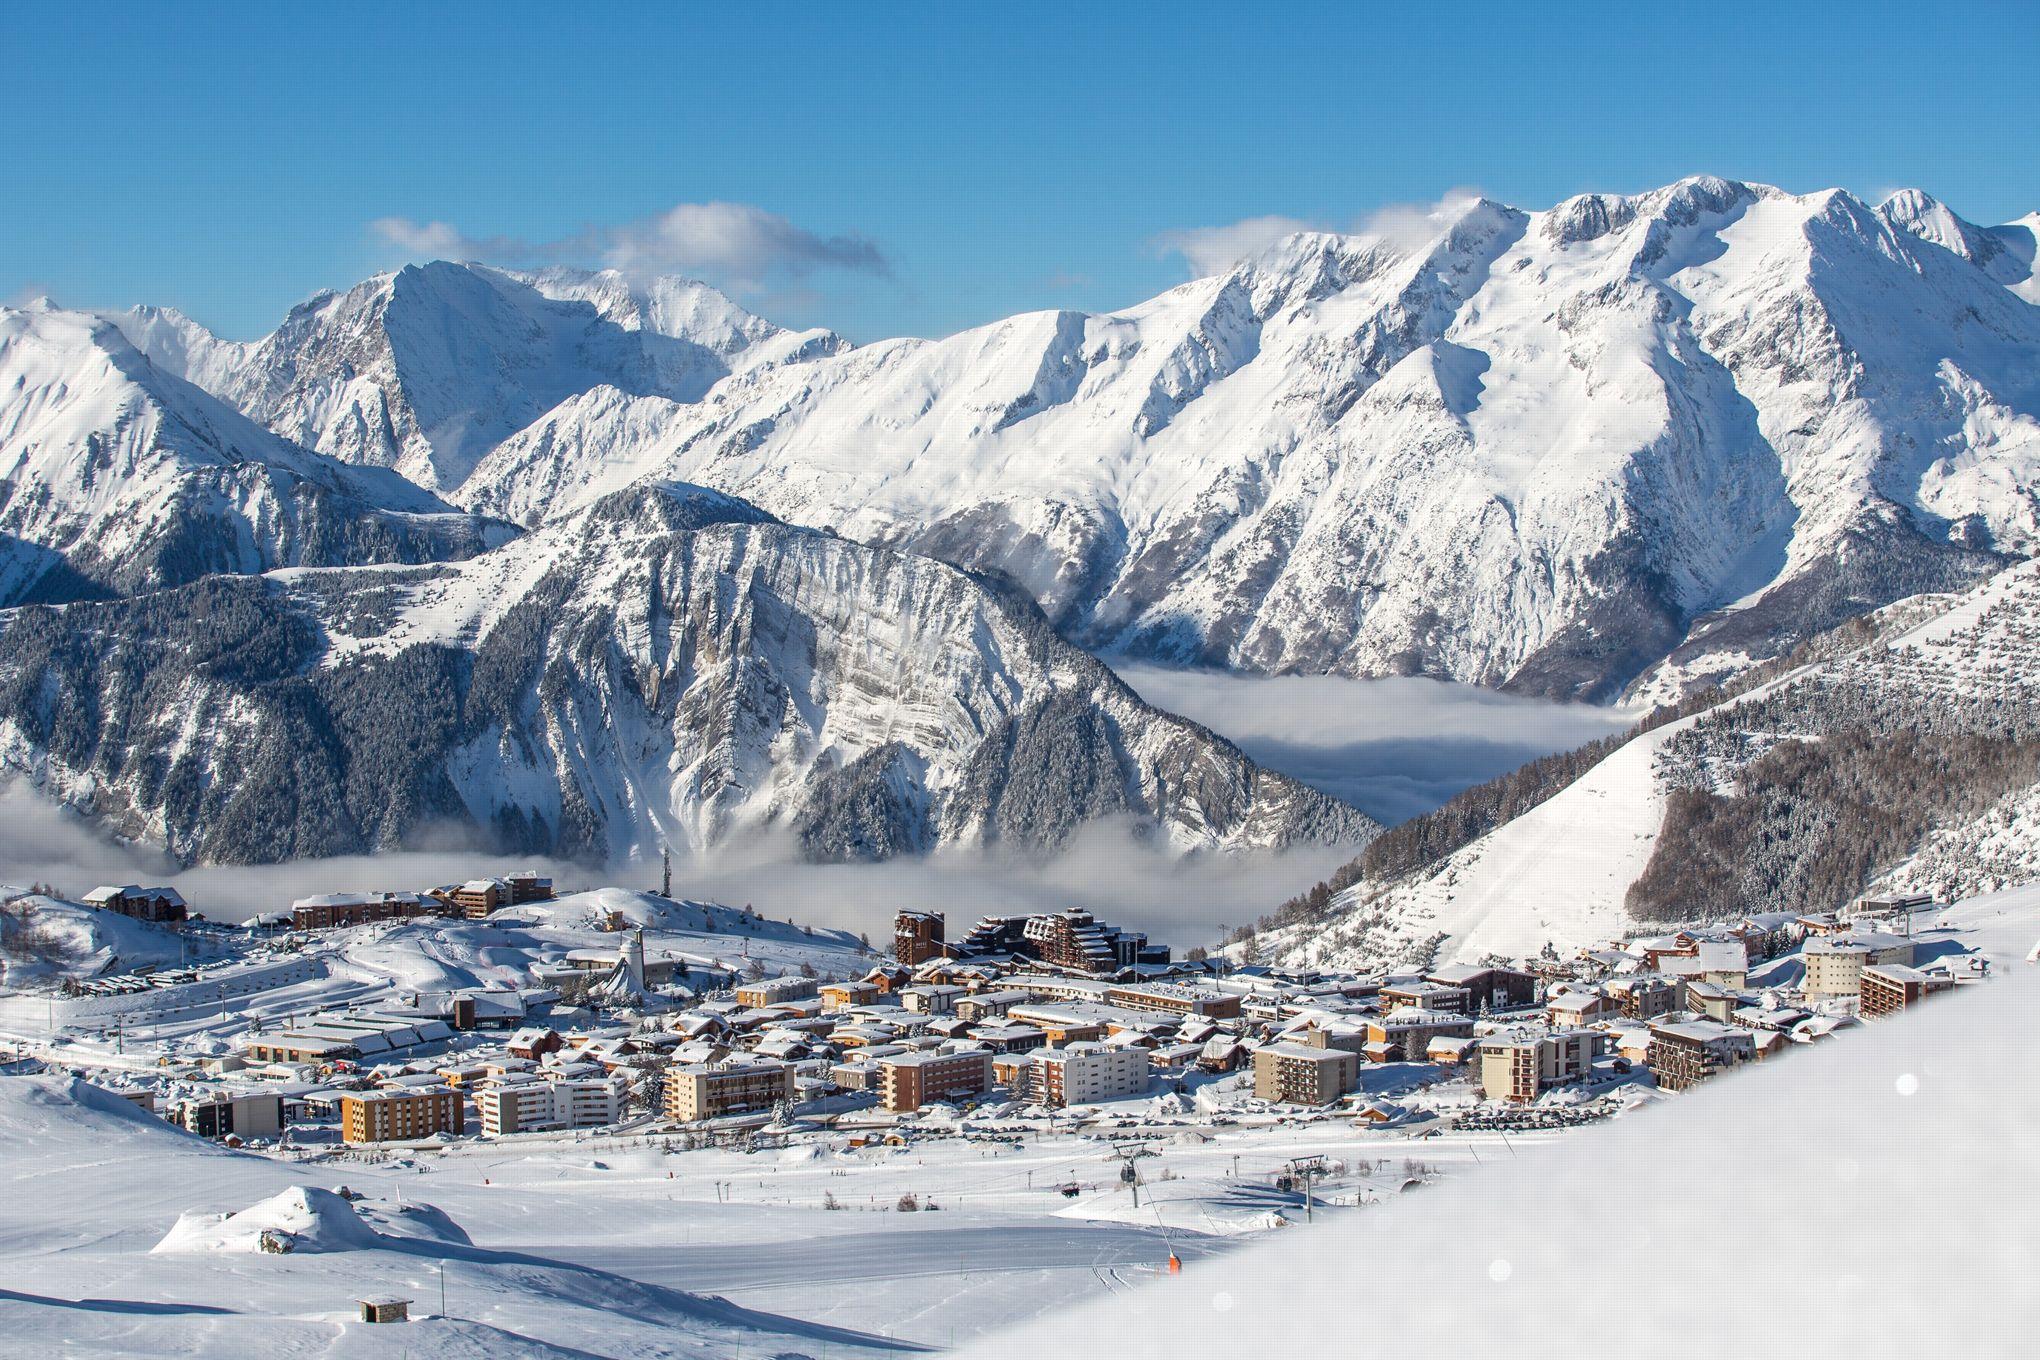 alpe d'huez prosneige ecole de ski